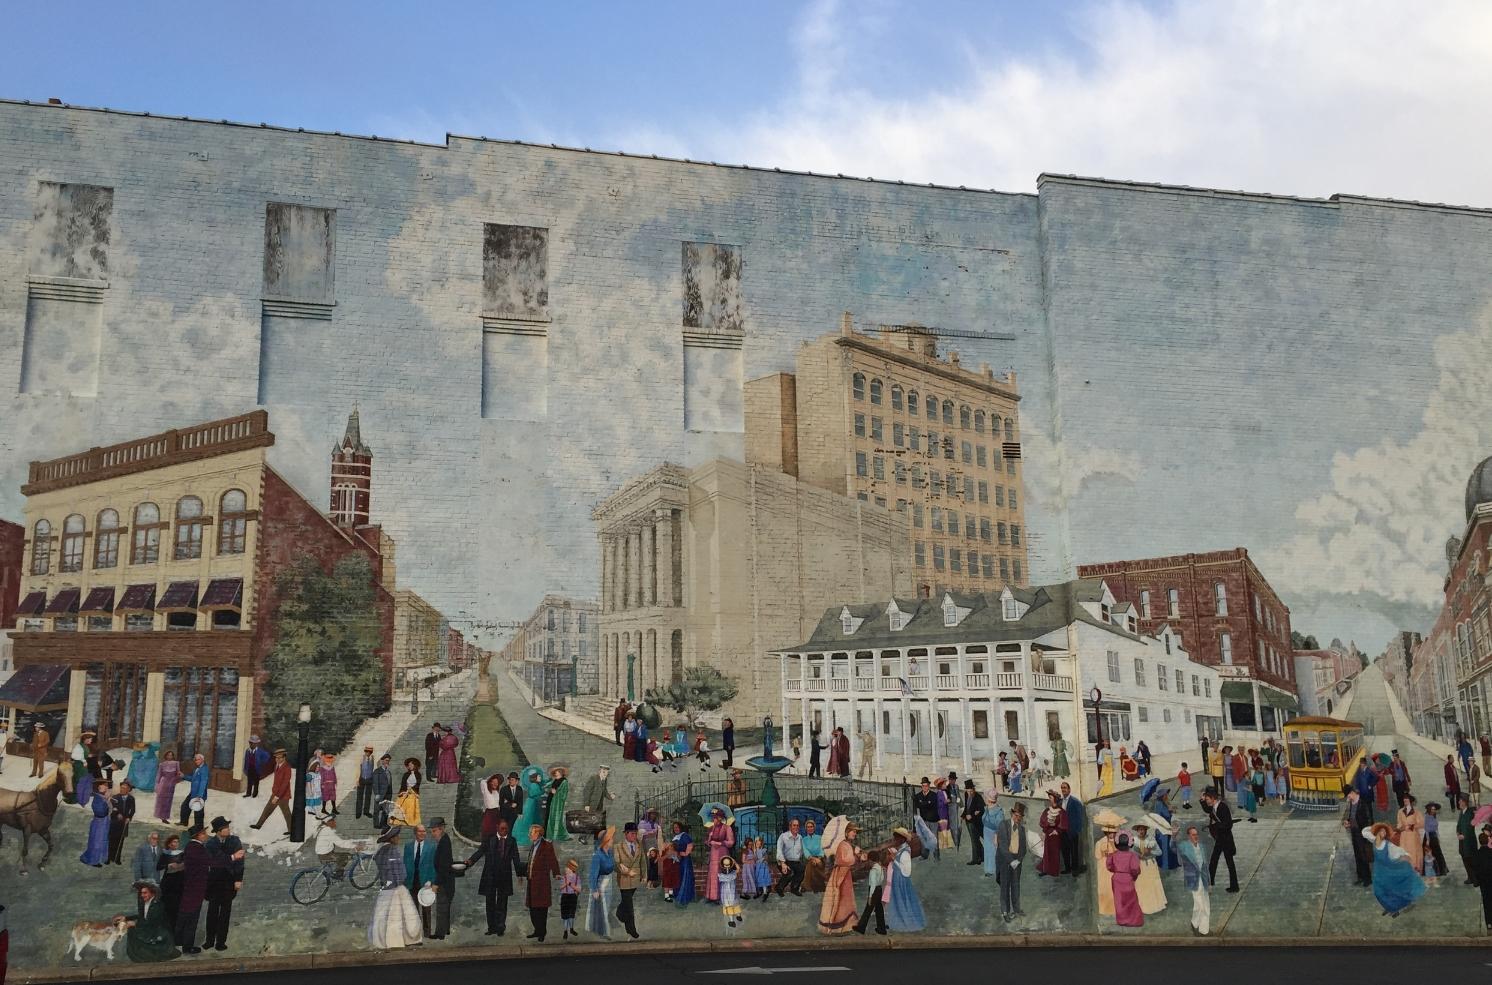 Mural in downtown Salisbury, North Carolina